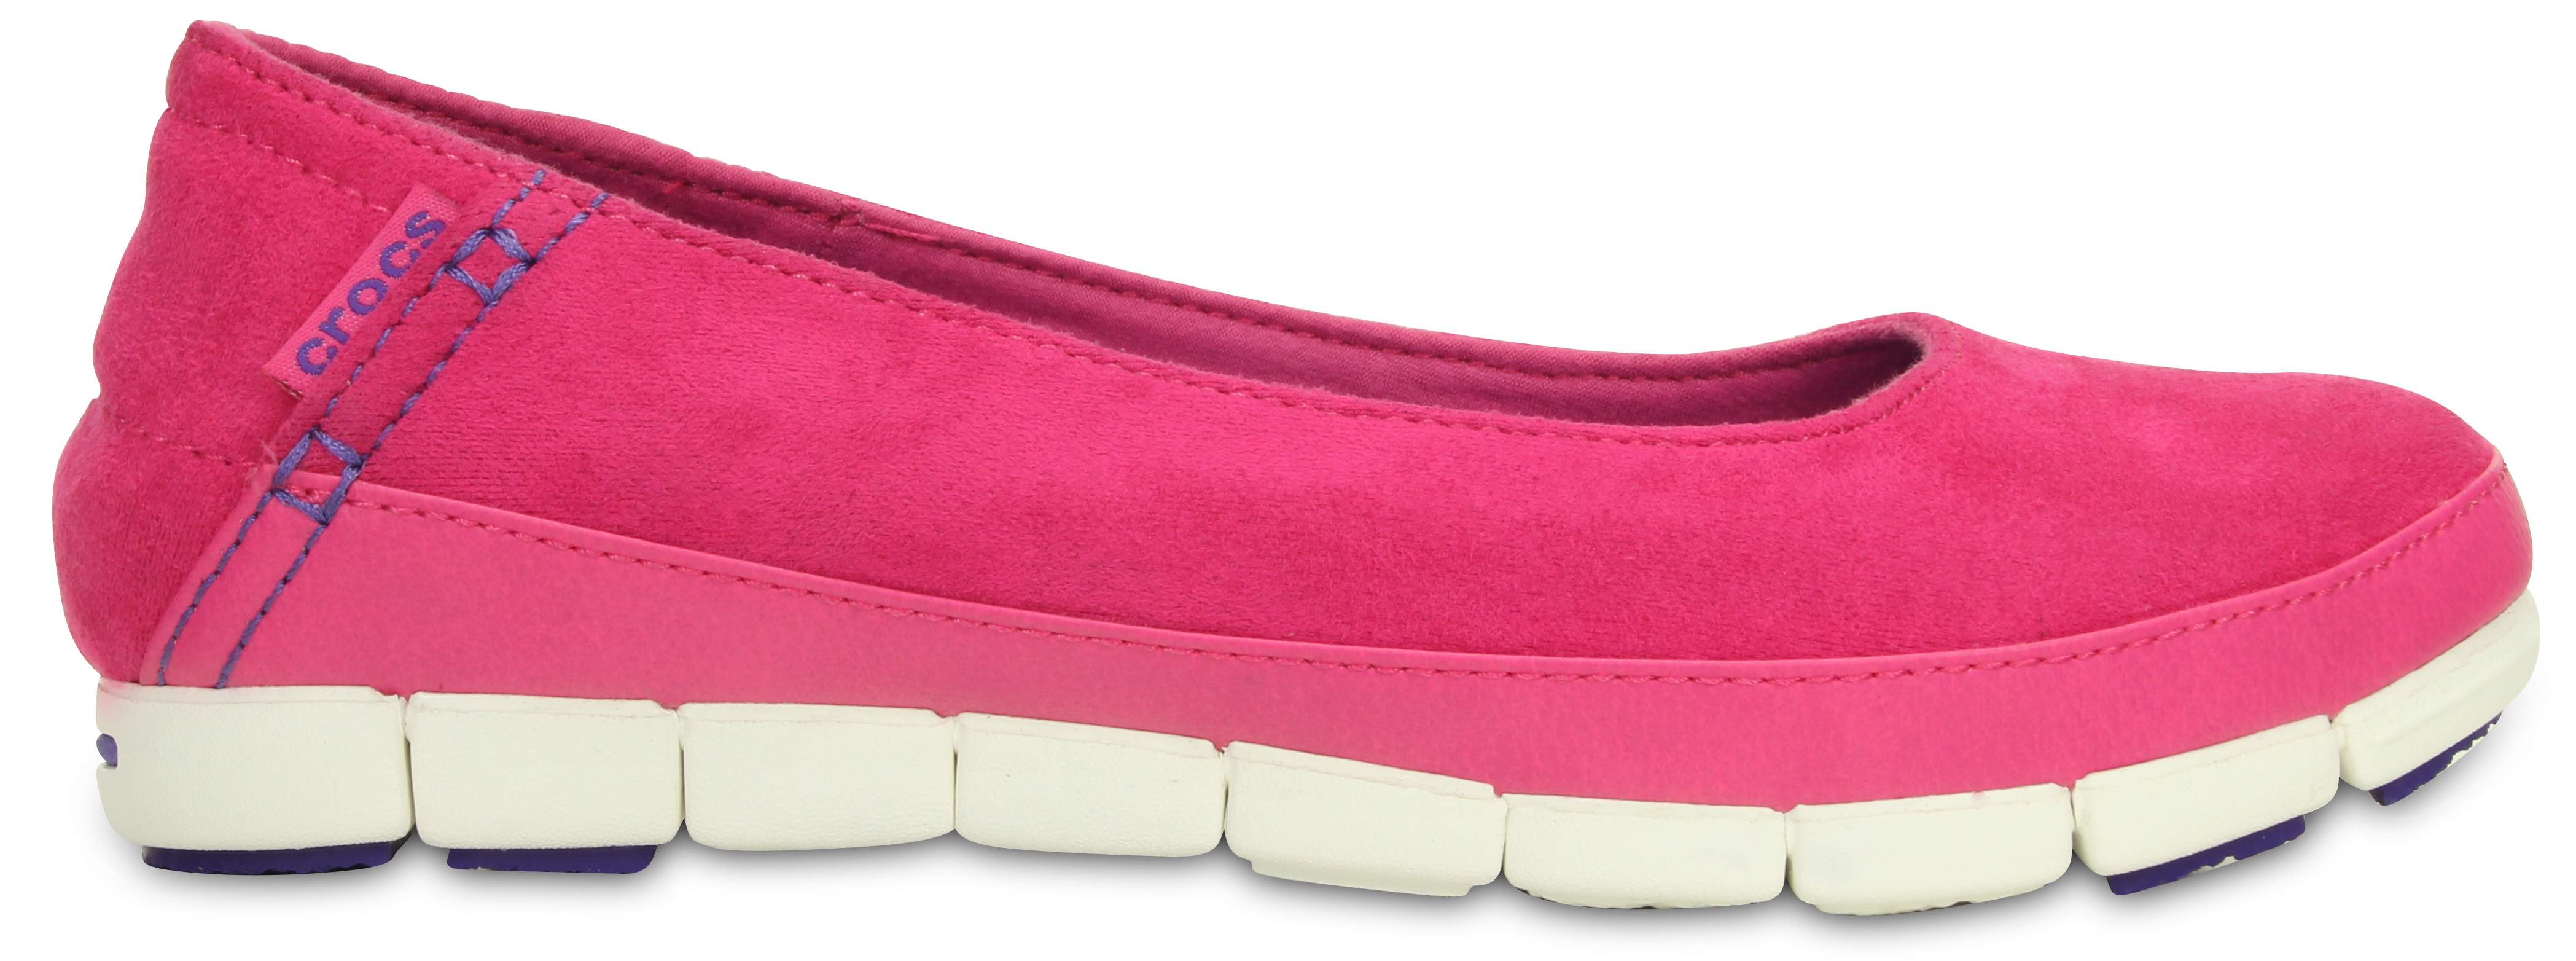 Kvinnors Wrap ColorLite Loafer sko